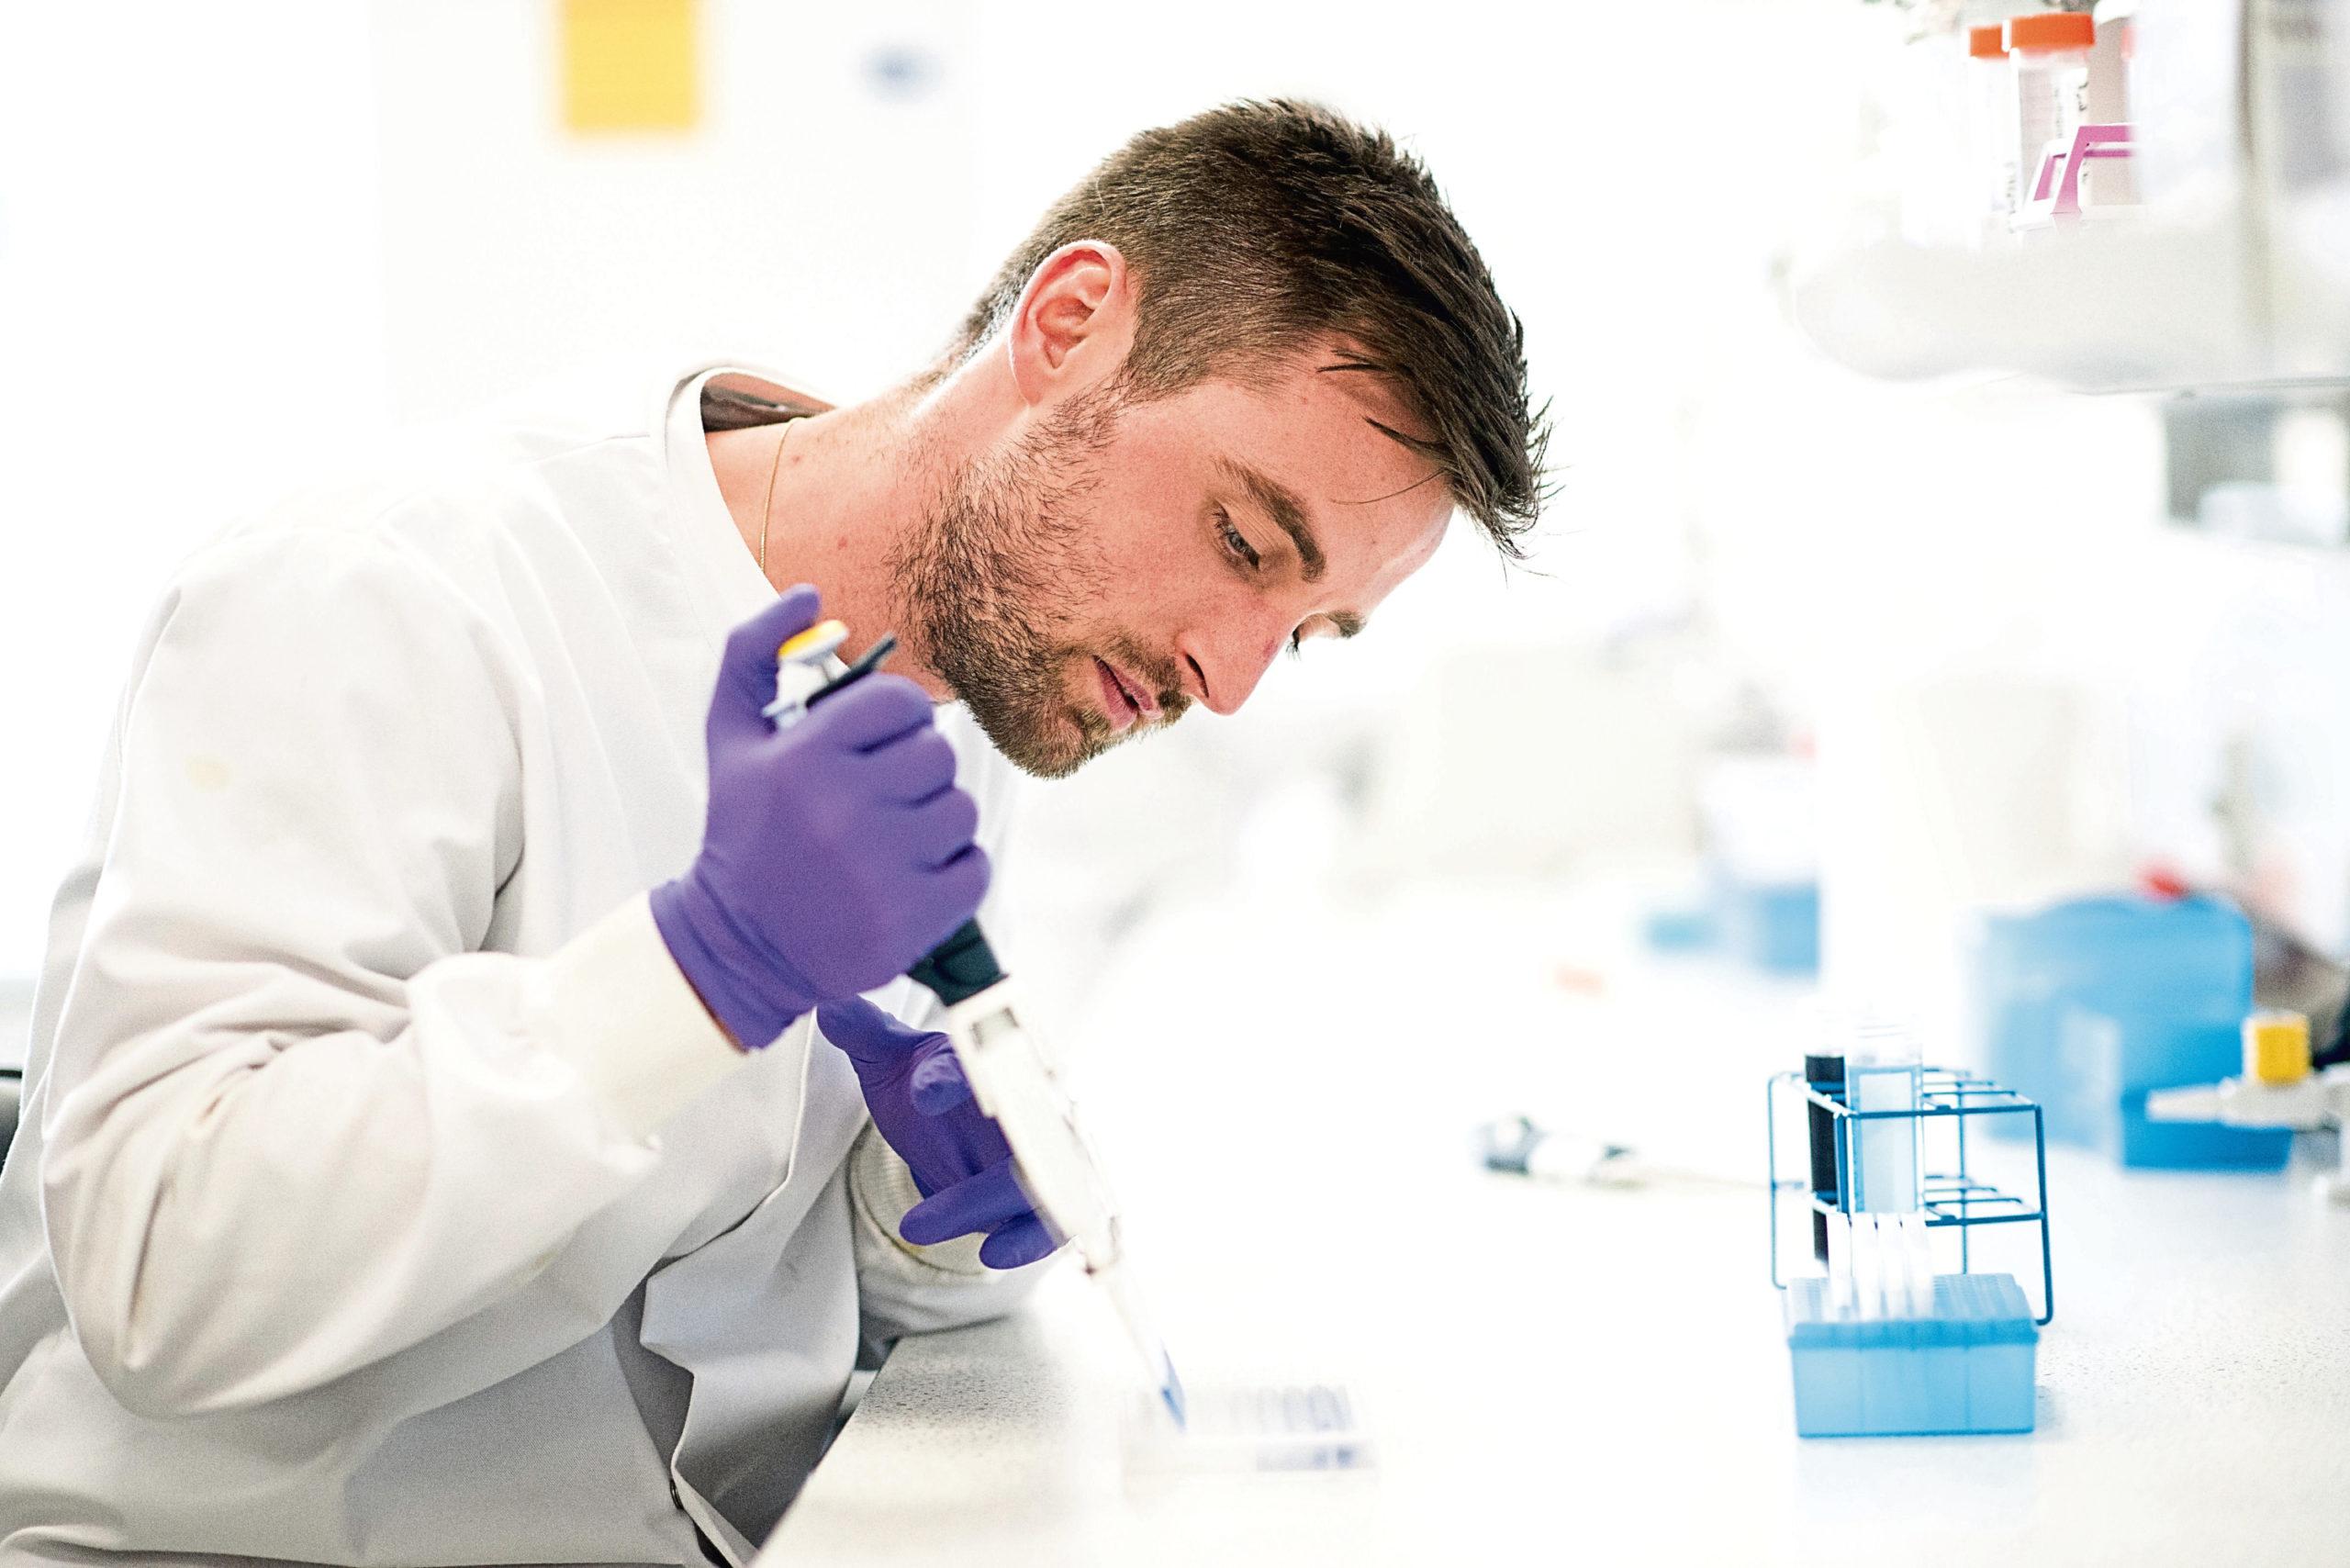 Labwork being undertaken by biotechnology firm 4D Pharma